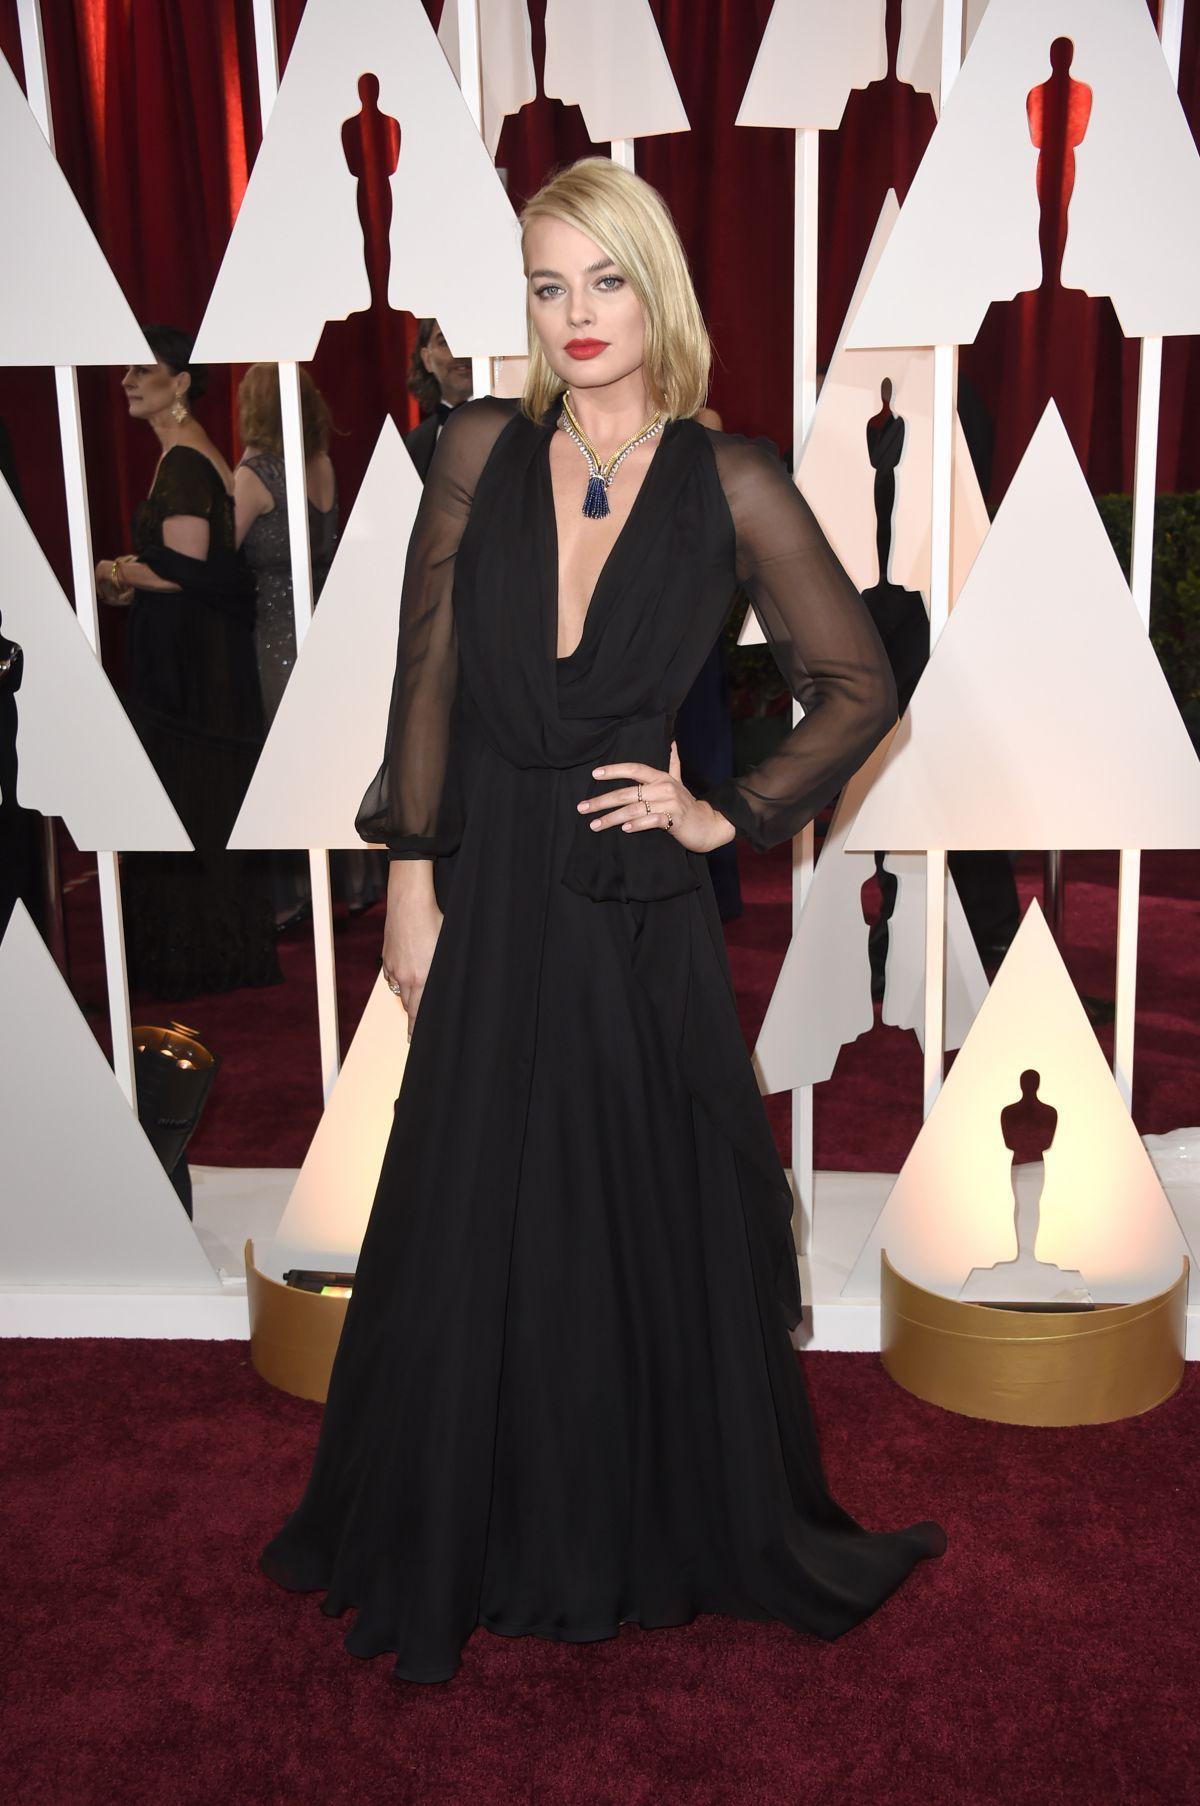 Academy awards fashion wrap 6